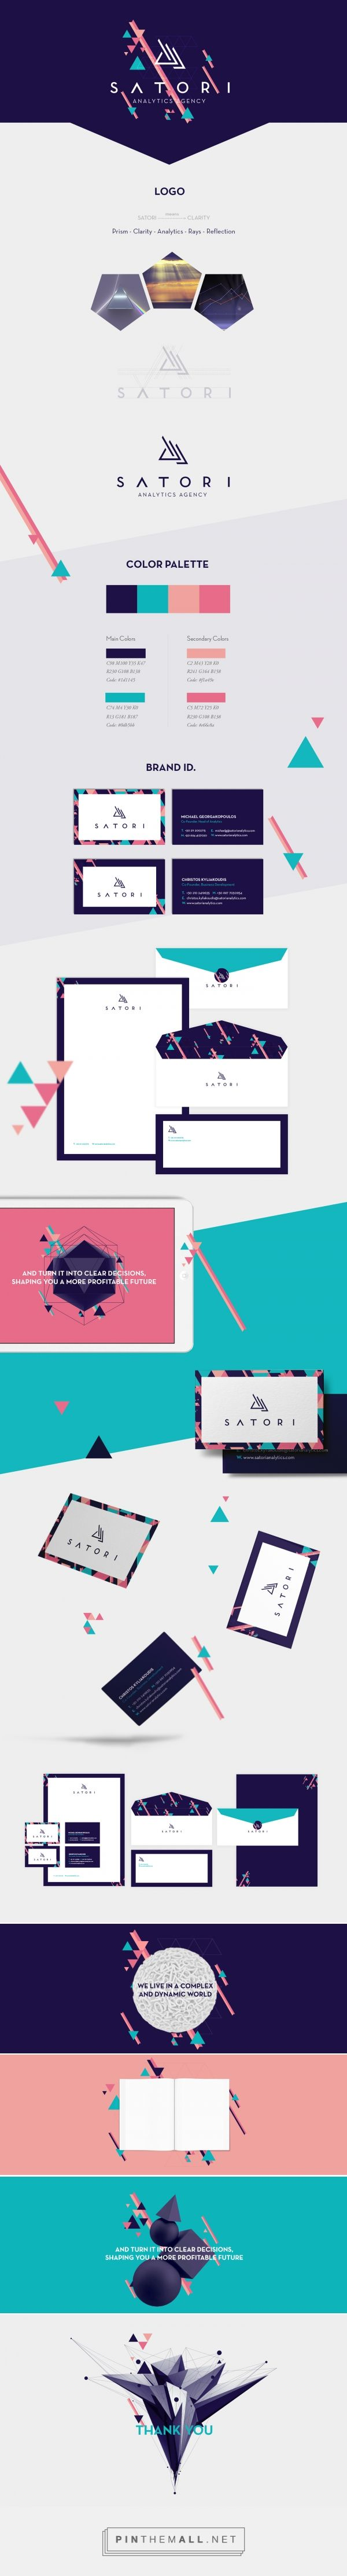 Satori Analytics Agency Branding on Behance | Fivestar Branding – Design and…